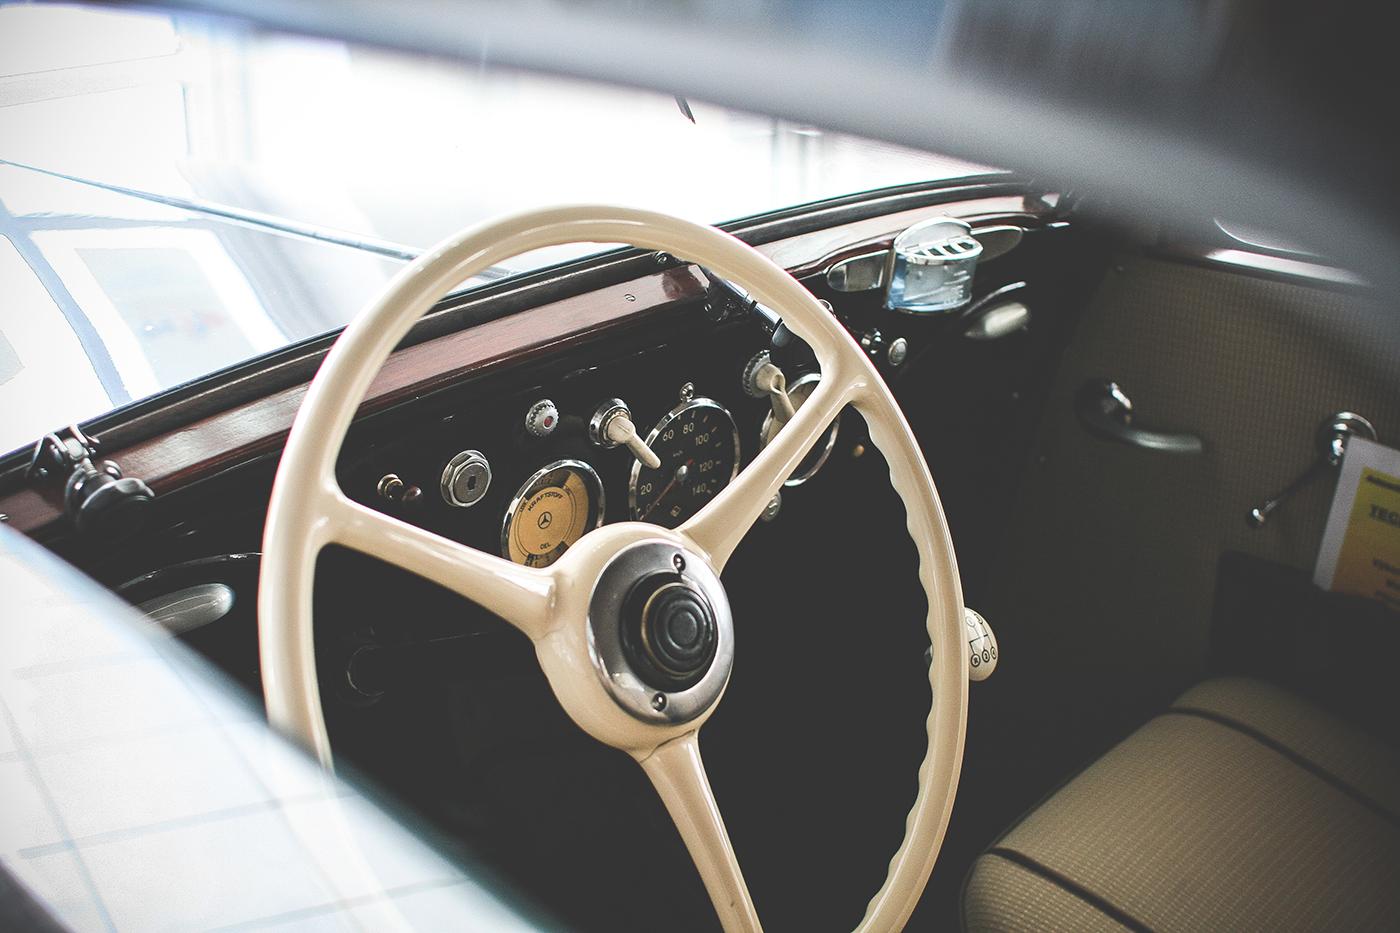 http://autobedrijfsmits.nl/wp-content/uploads/2016/12/oldtimer-car-steering-wheel-picjumbo-com.jpg